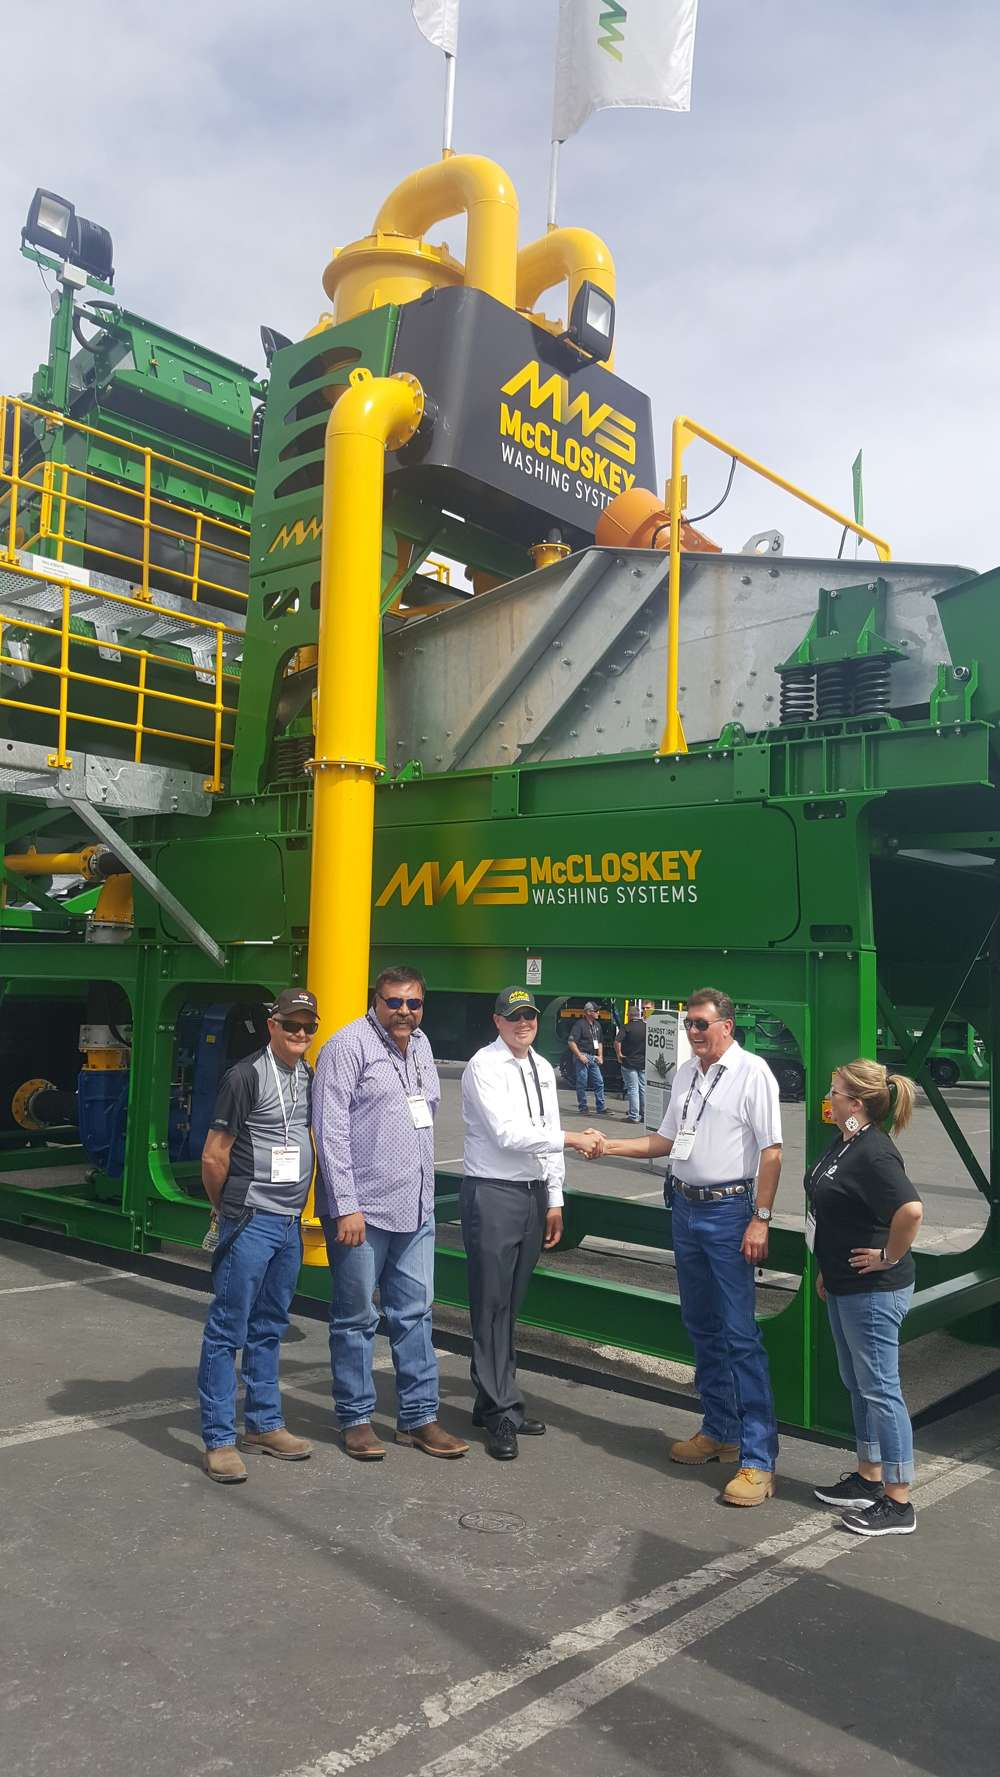 Excel Machinery Ltd & McCloskey Washing Systems shaking hands on dealership agreement. Left to Right: David Timmons, Charles Romero, Craig Rautiola (MWS), Matt Garth & Jenifer Payne